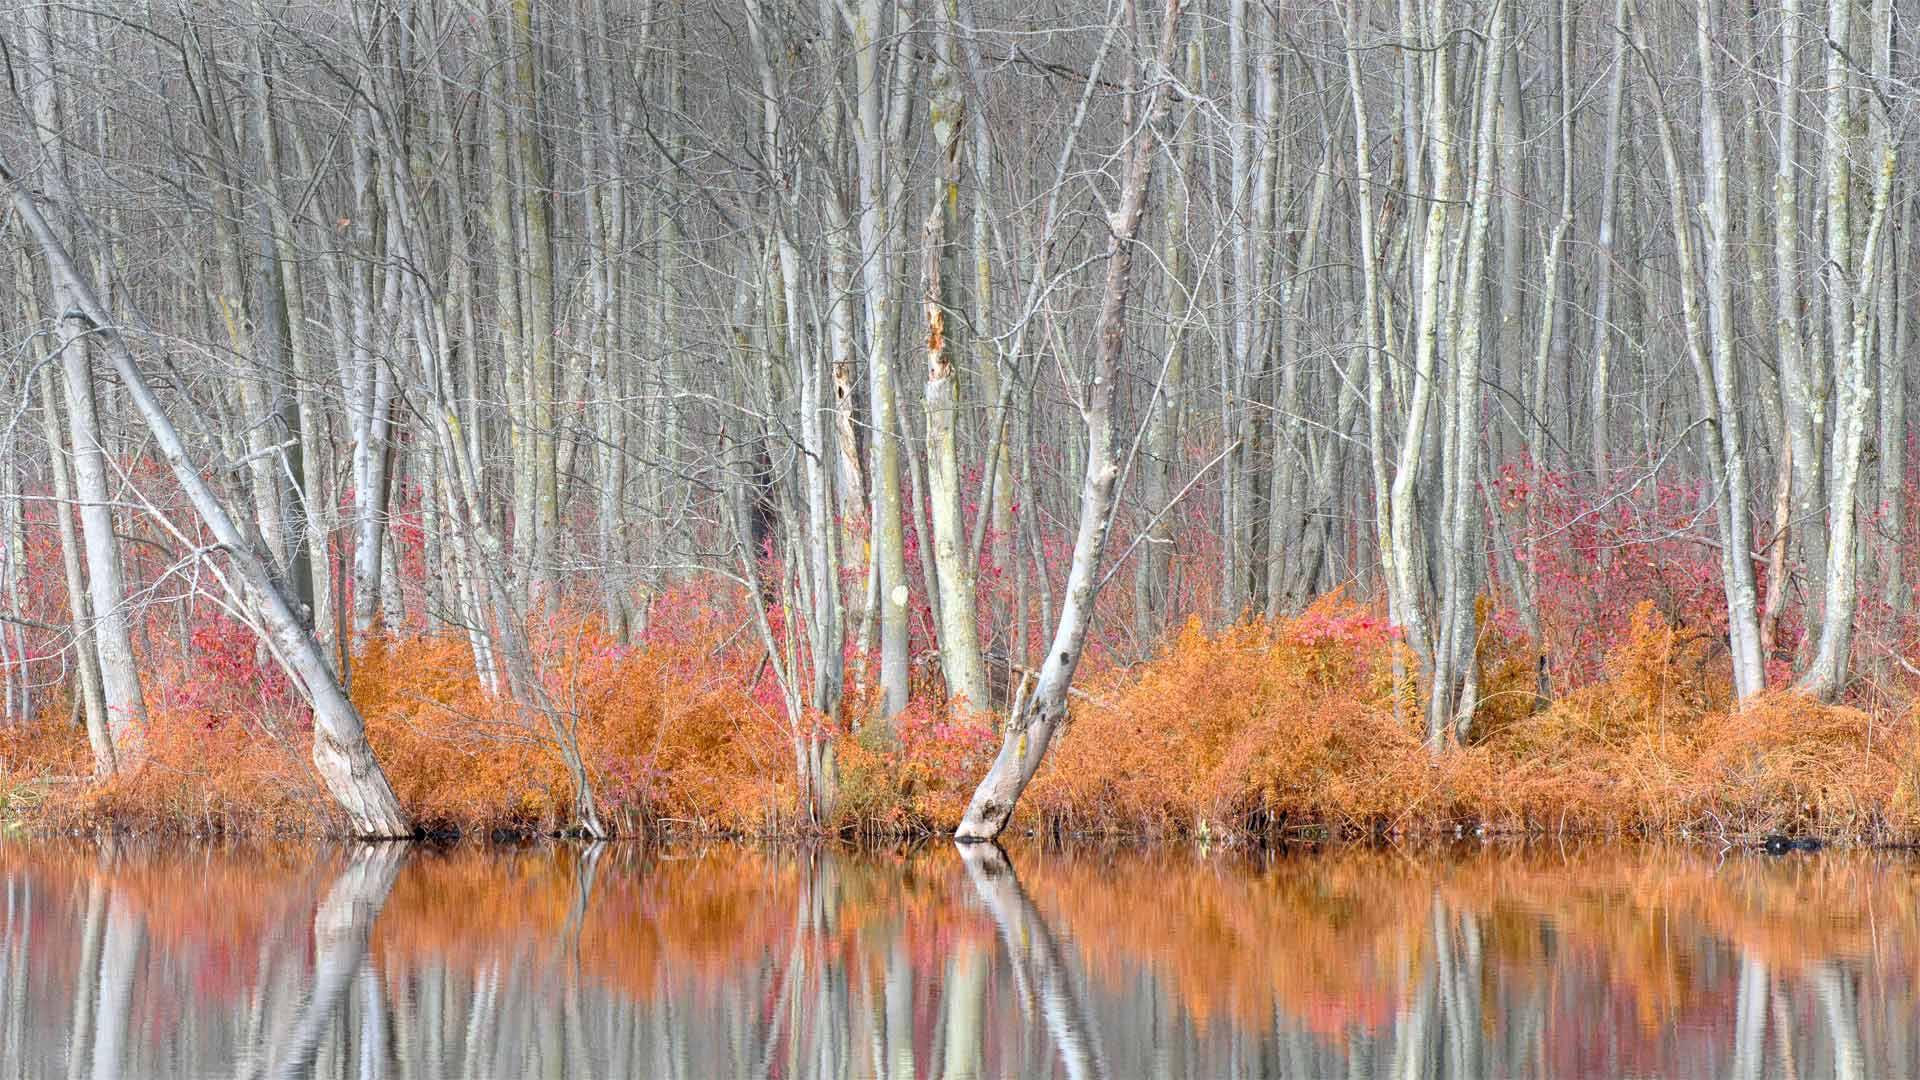 Beaver Lake Nature Center, New York (© Chris Murray/Alamy)(Bing United States)